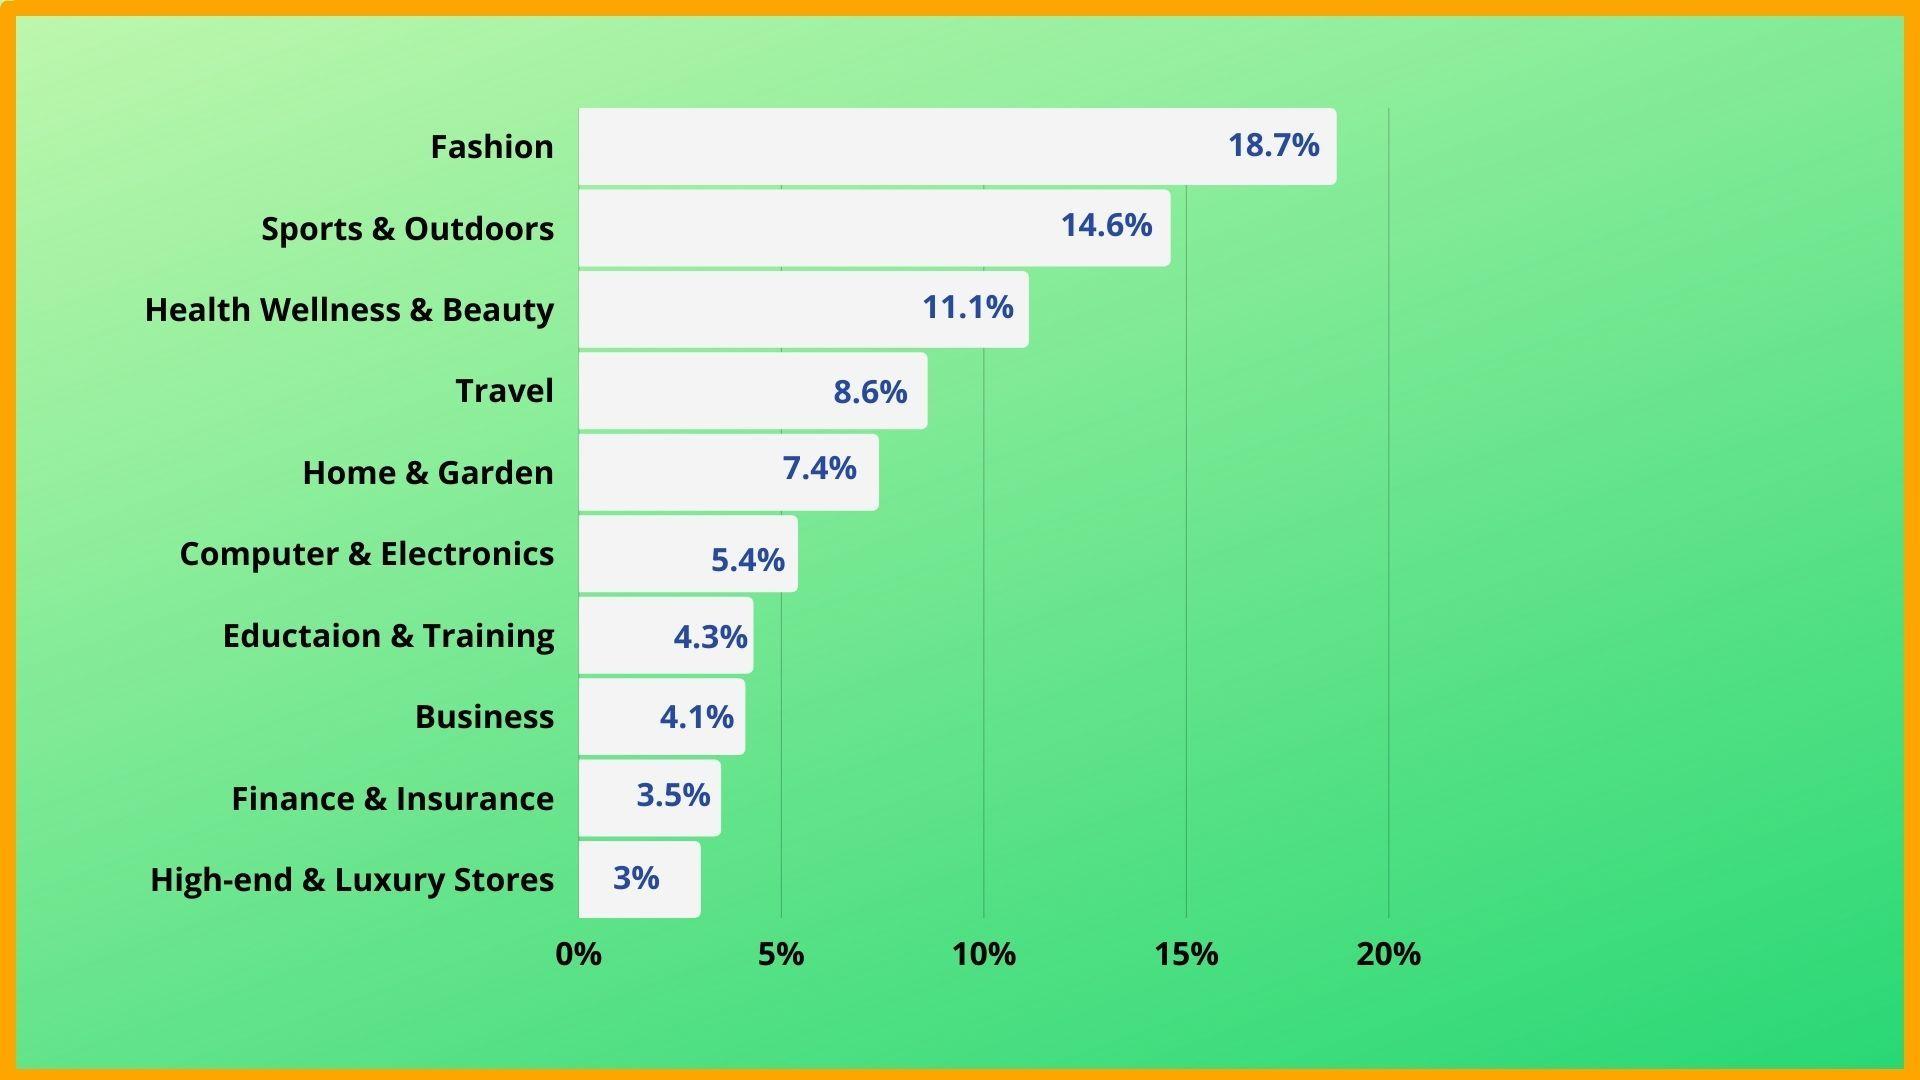 Top 10 Affiliate Categories